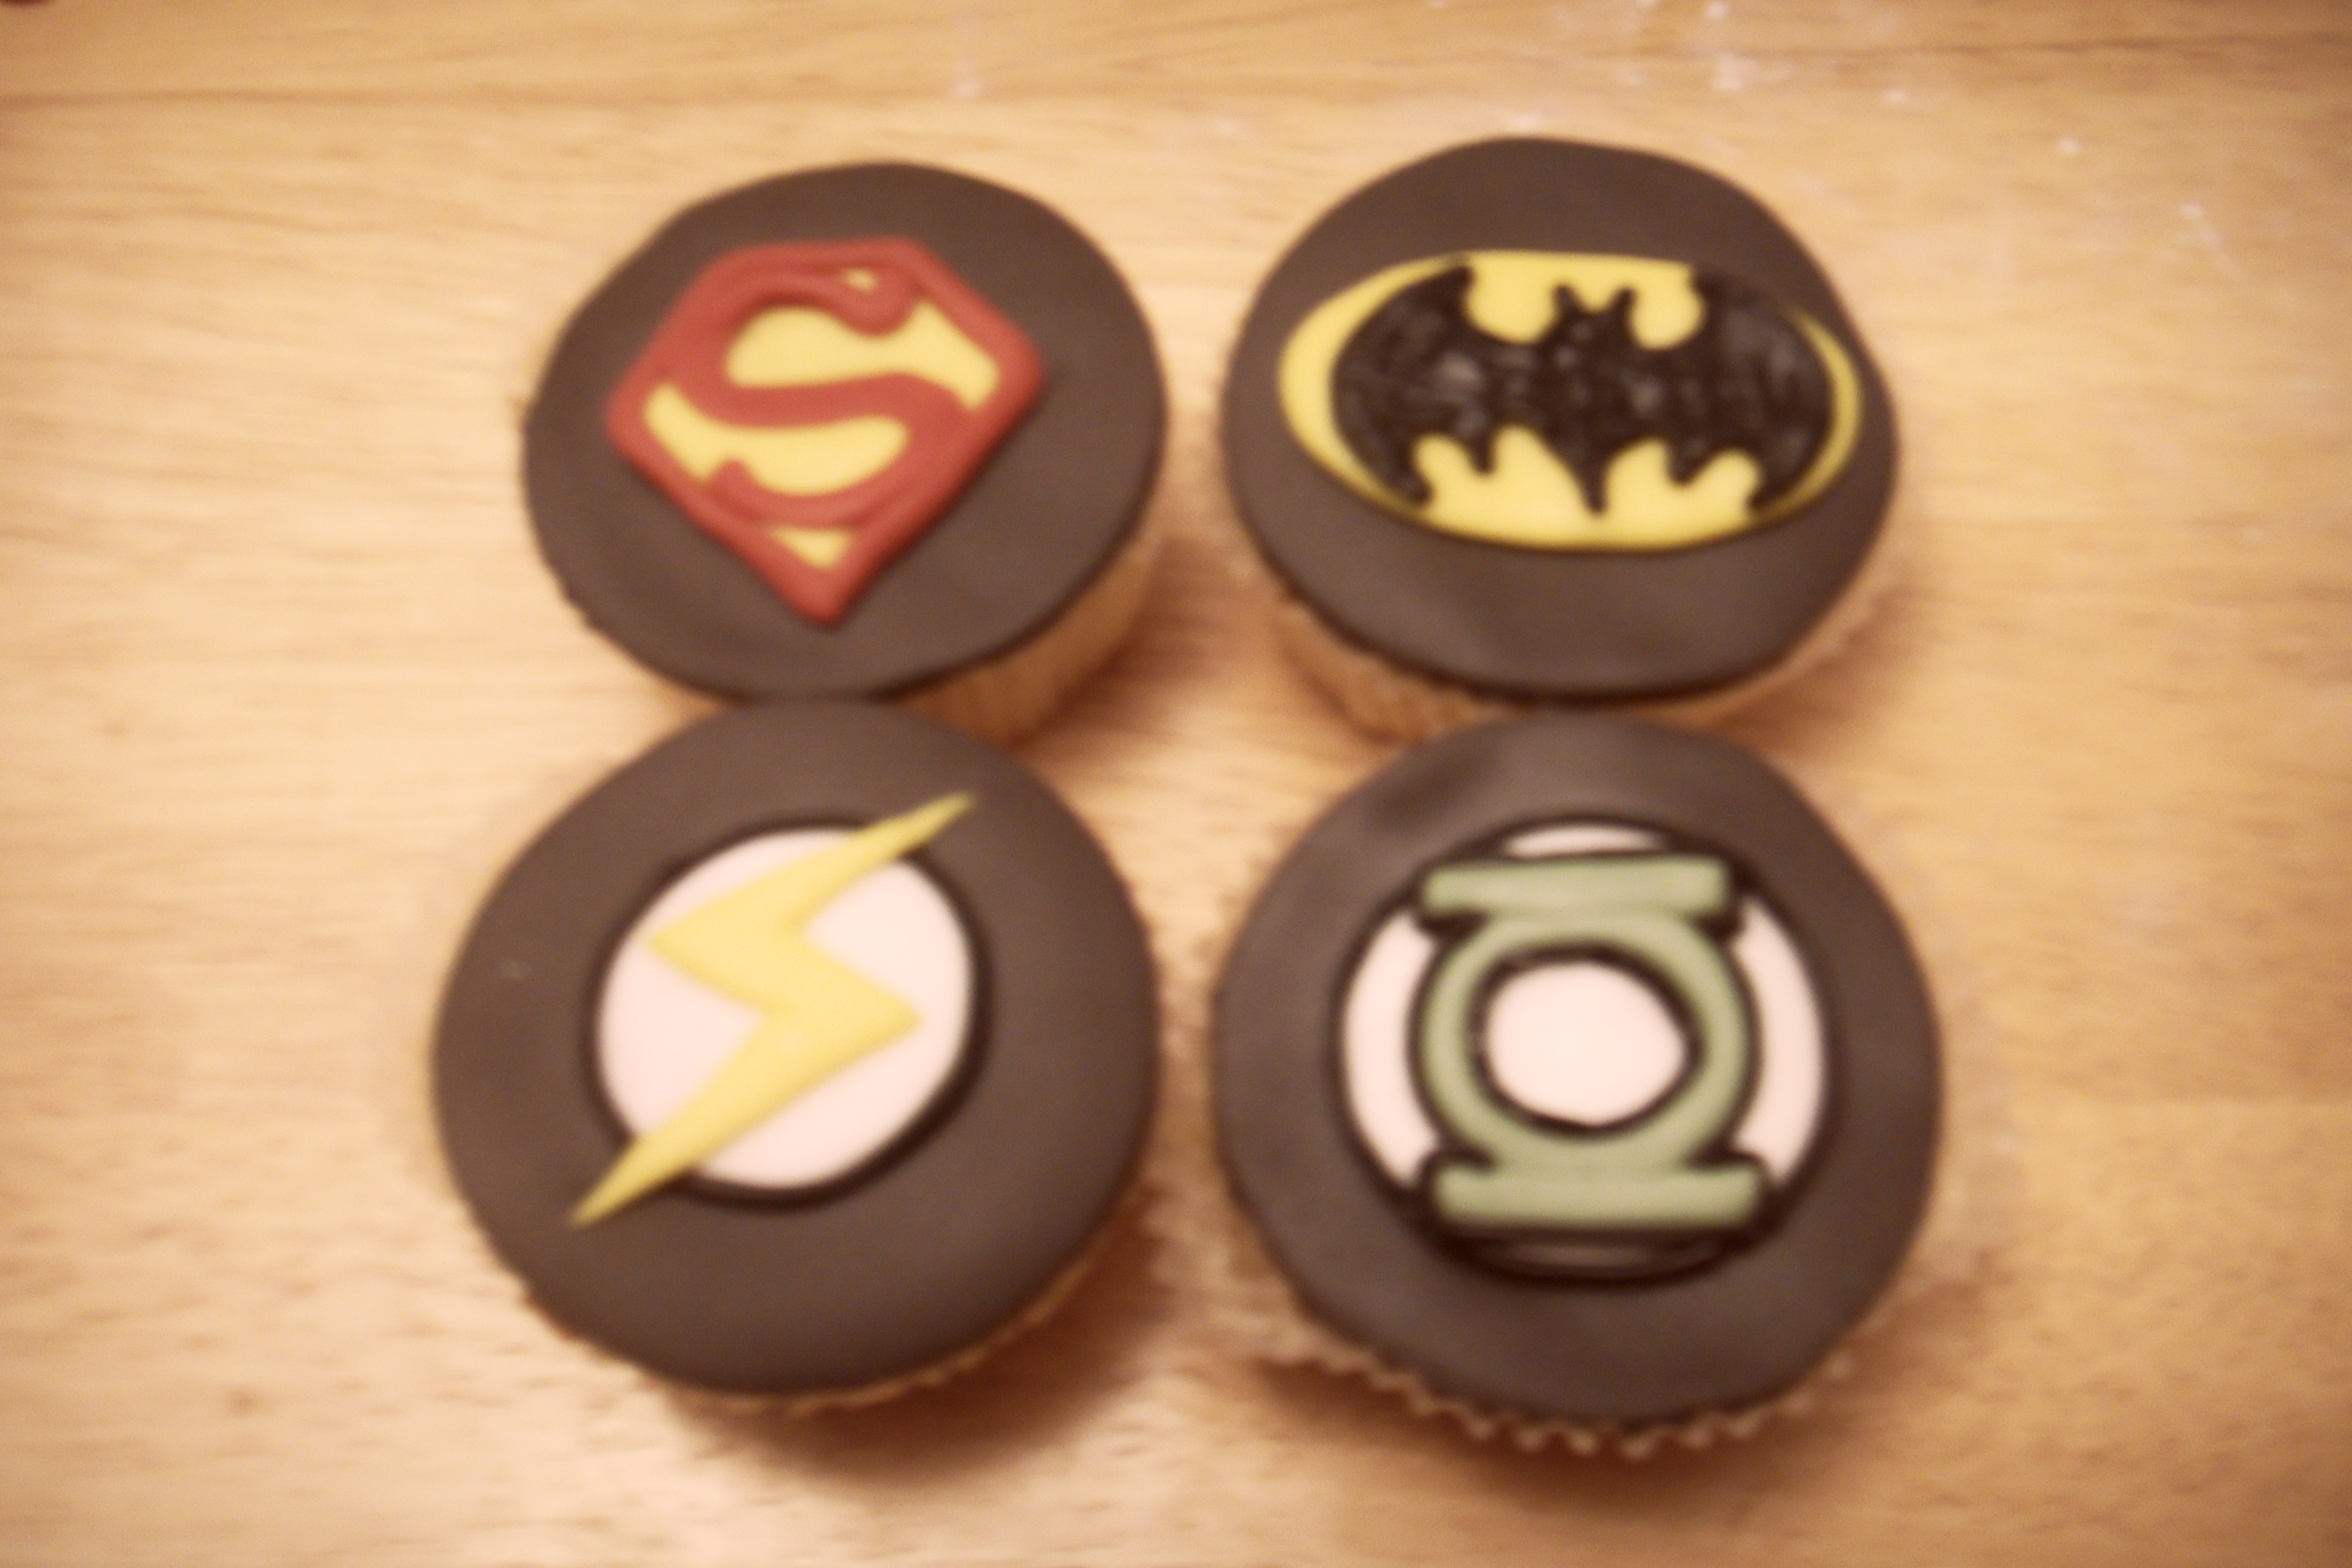 Picture of Nananana Nananana CUPCAKE.. I Mean BATMAN, Superhero Cupcakes